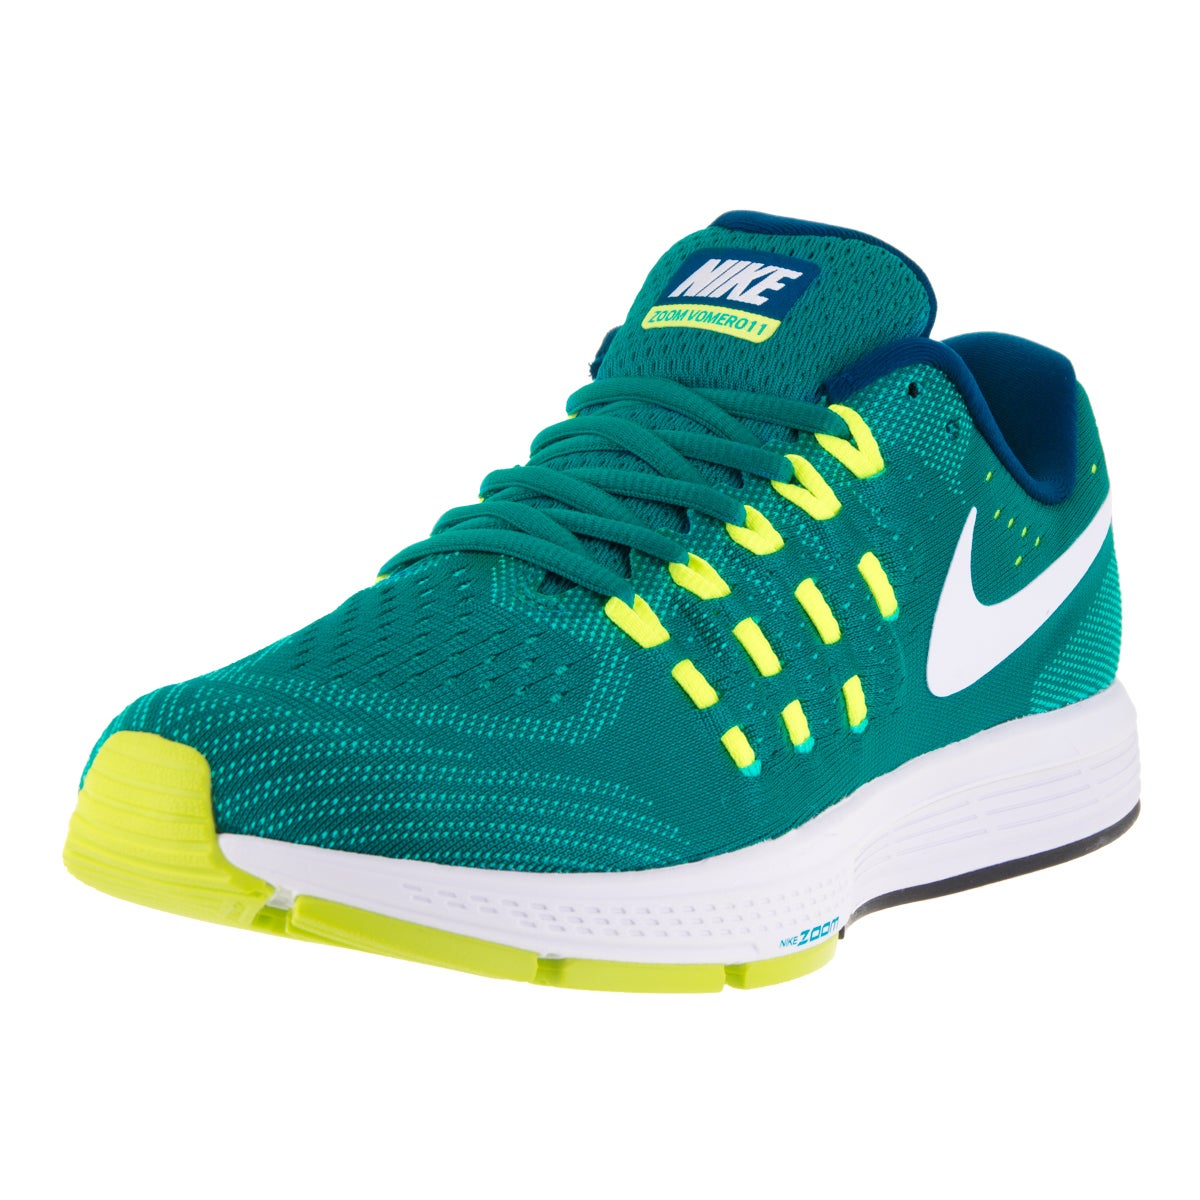 Nike Men's Air Zoom Vomero 11 Rio Teal/White/Volt/Clear J...